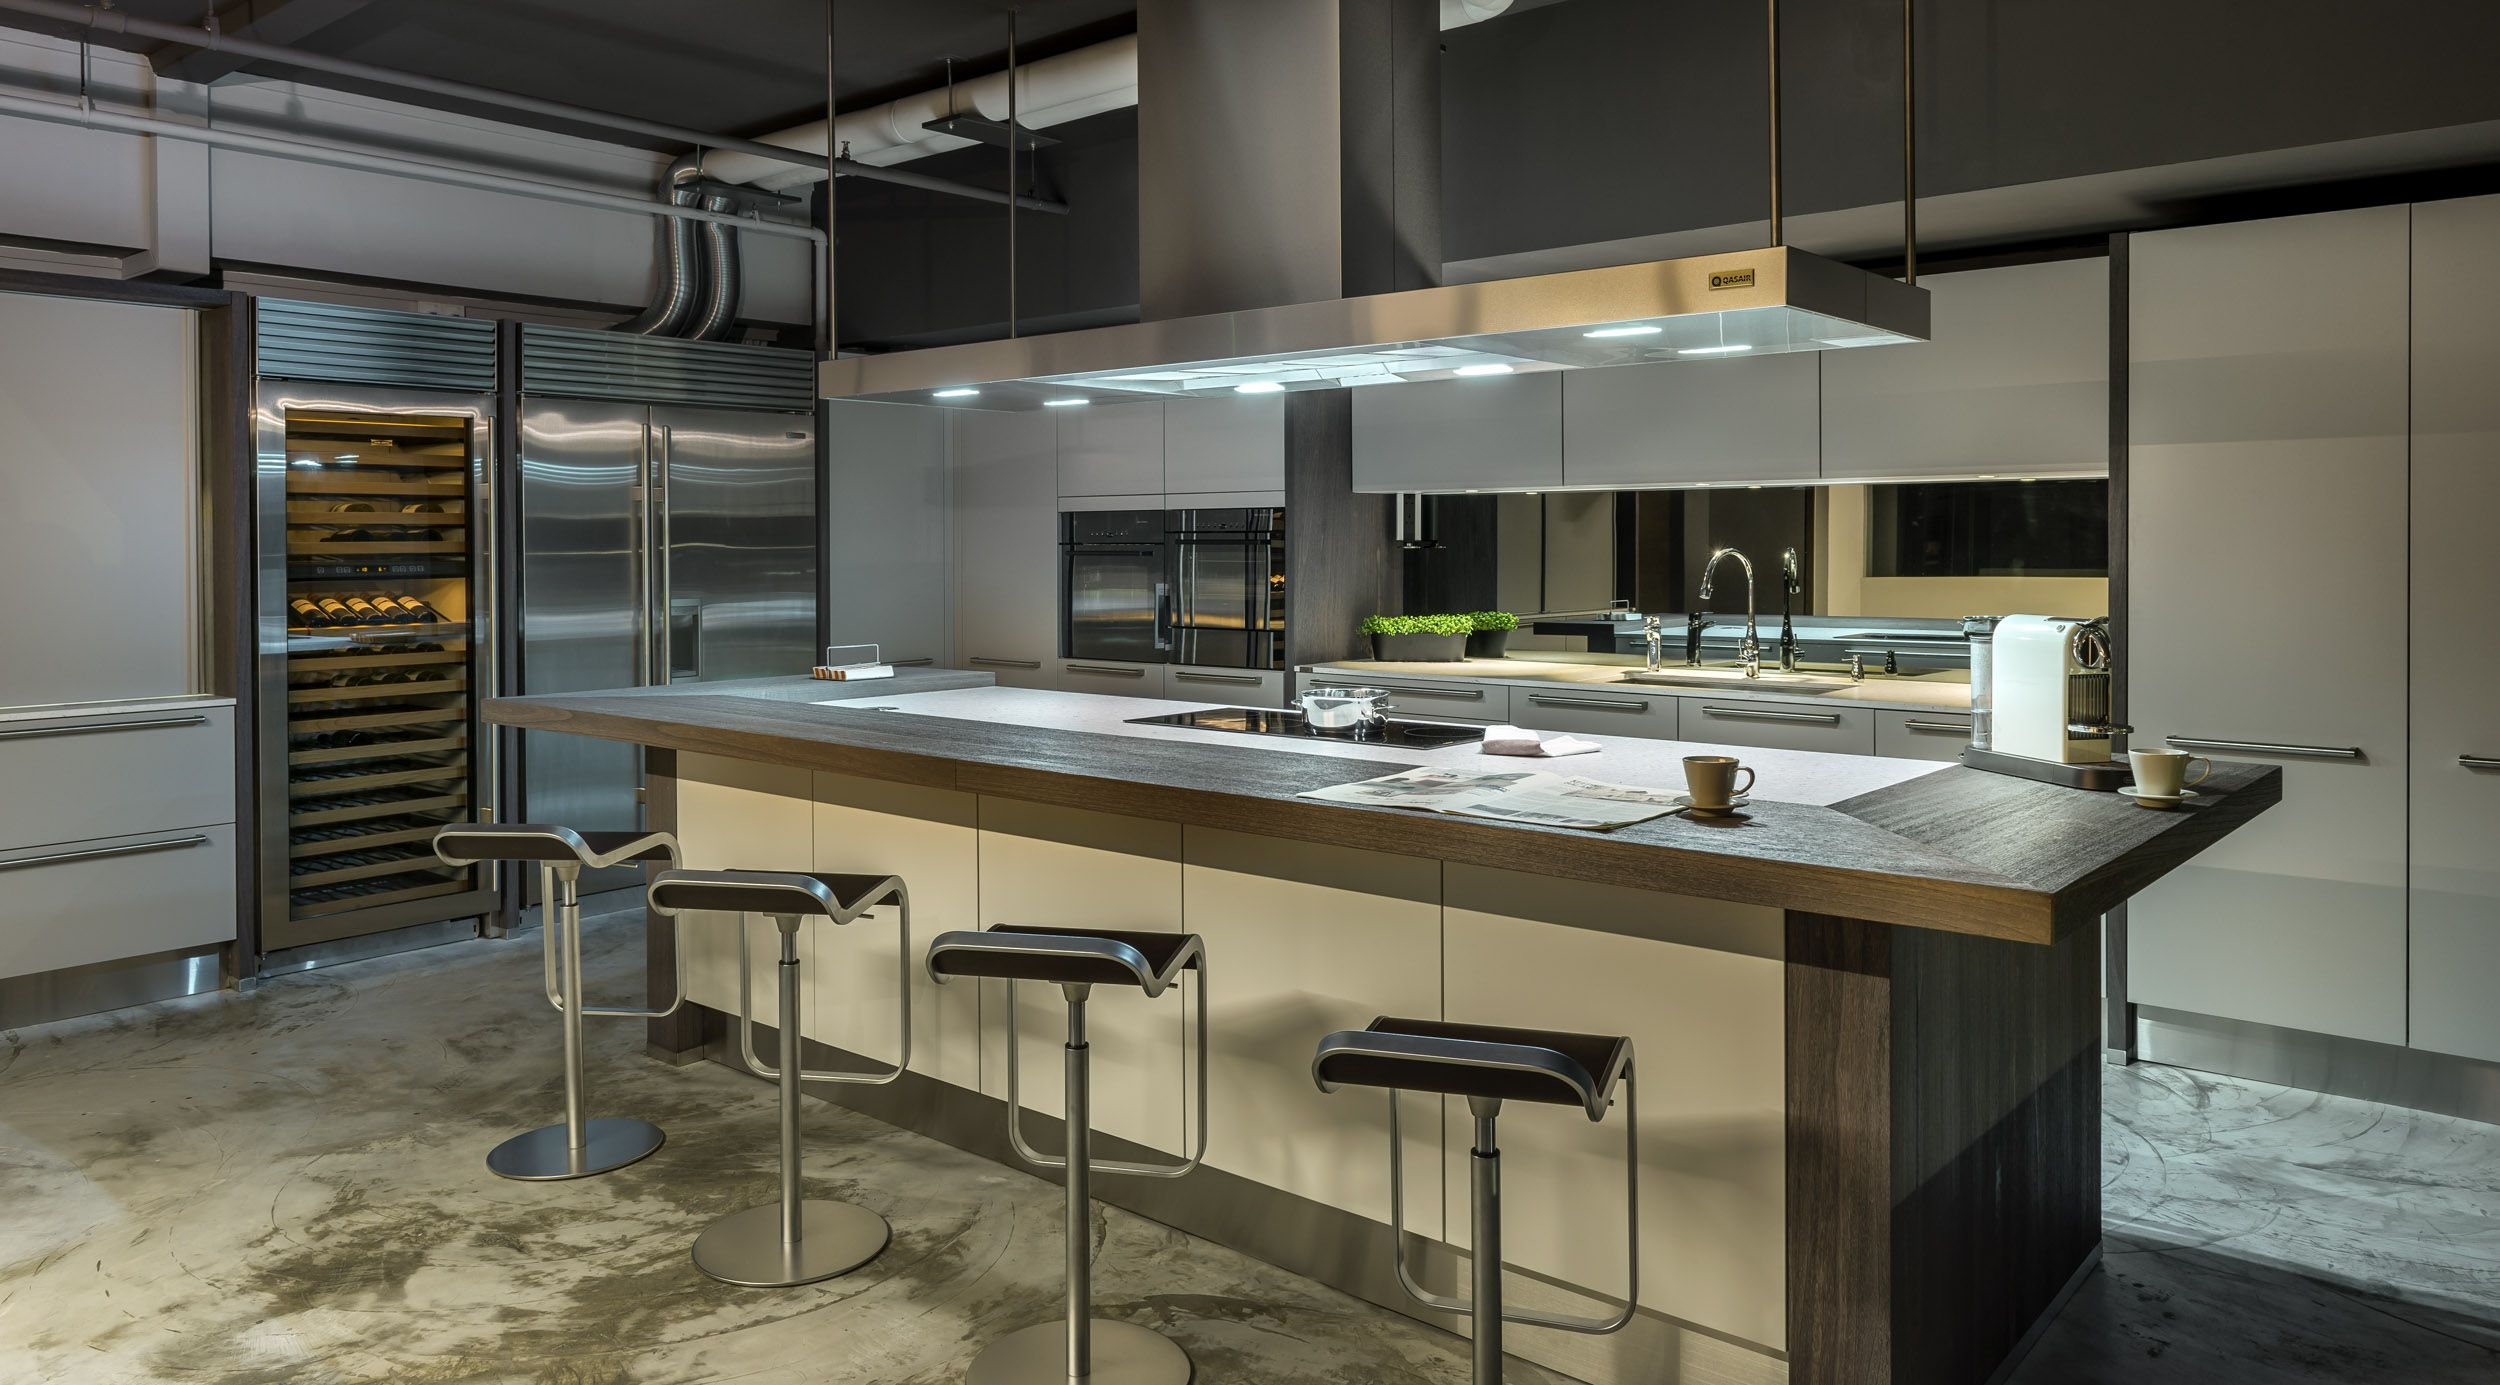 Ergos Kitchen  Home & Decor Singapore  Kitchen  Pinterest Endearing Kitchen Design Website Decorating Design